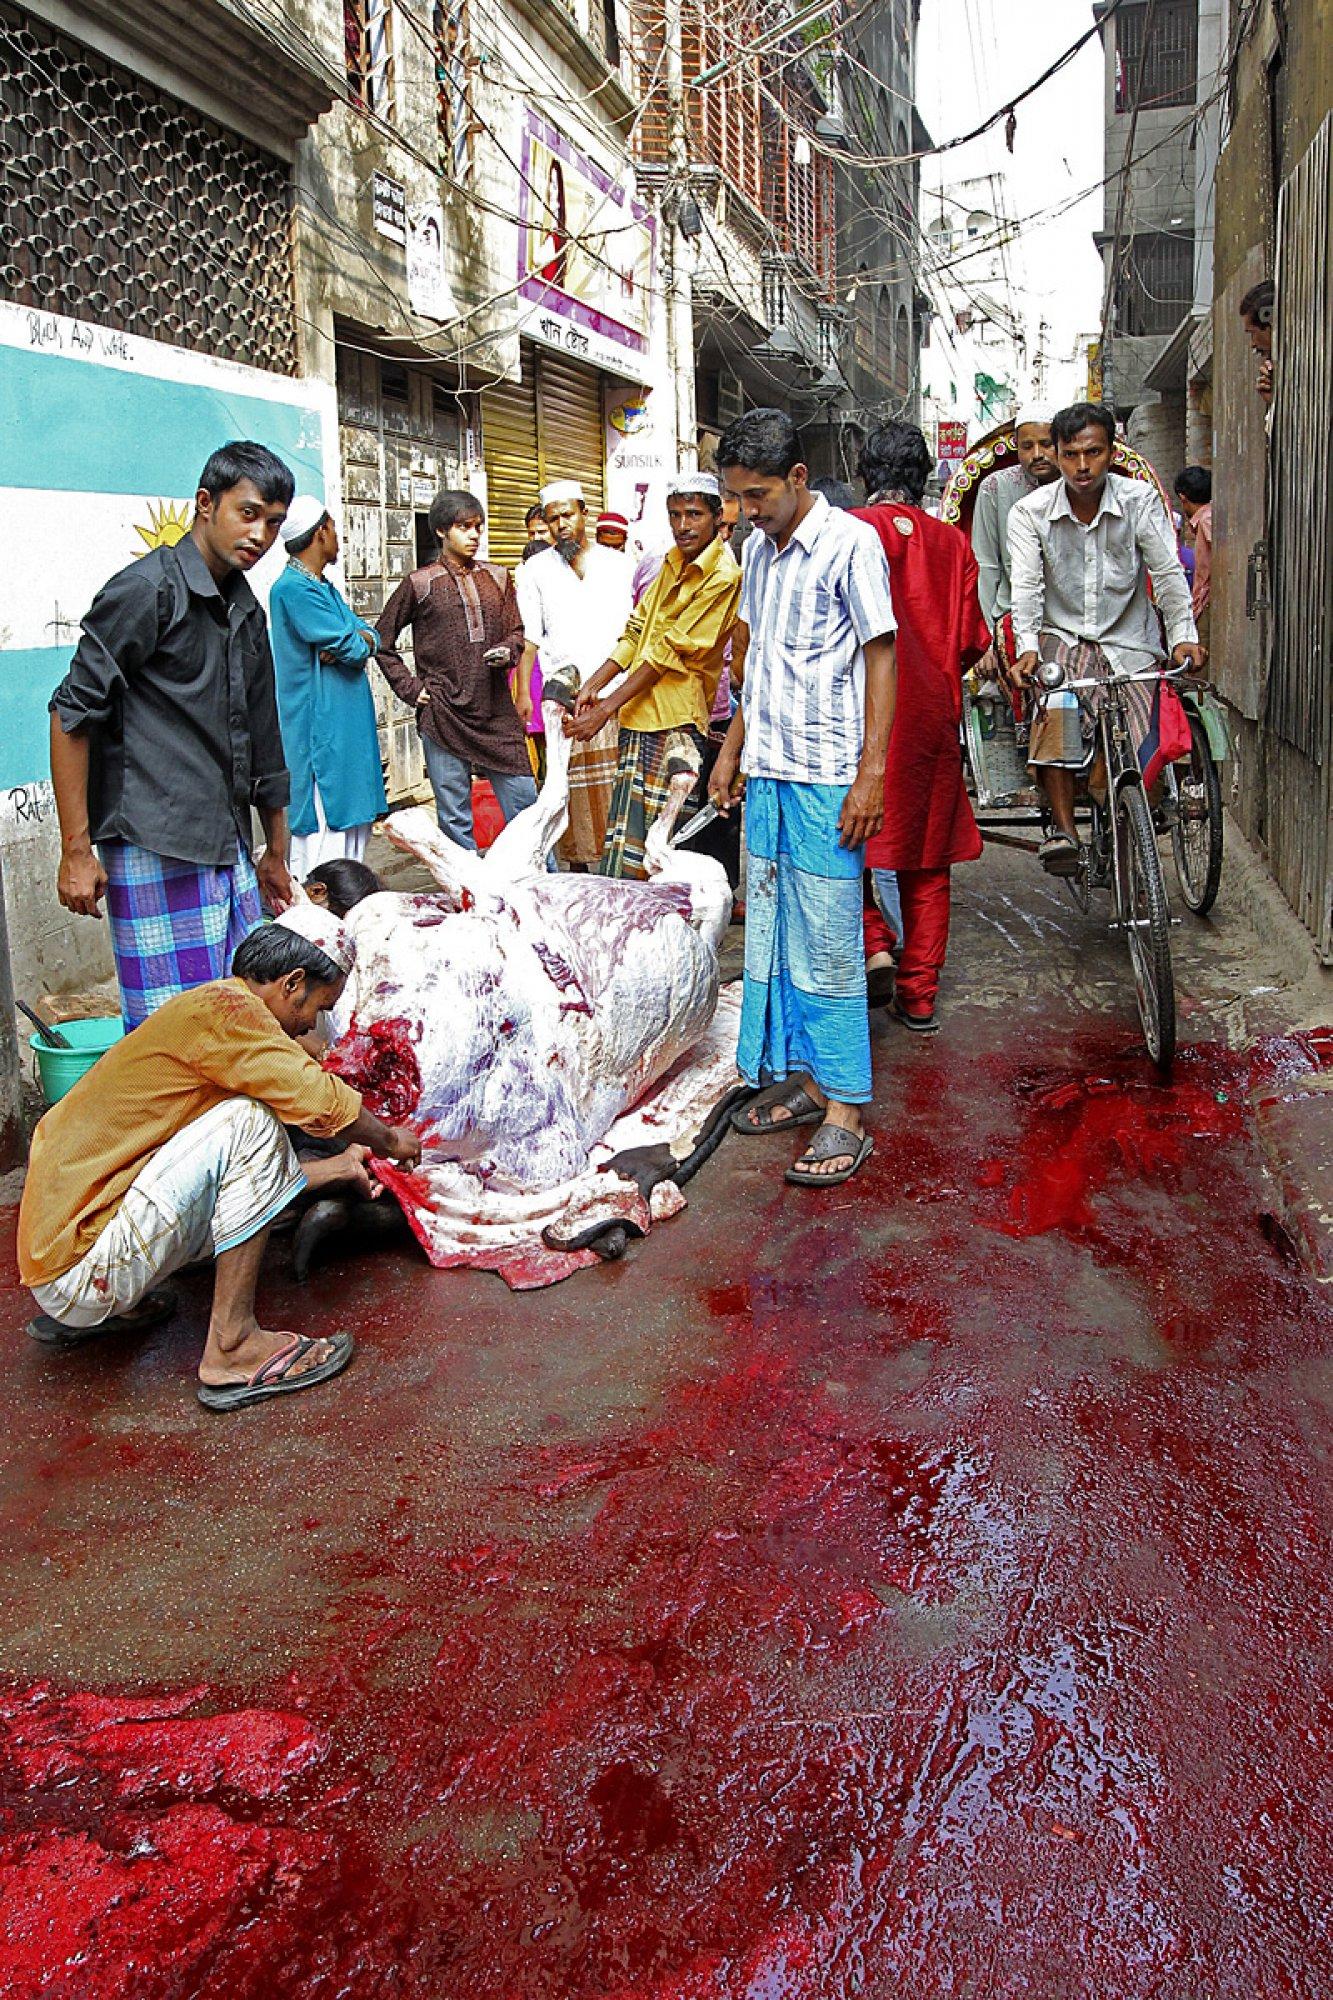 https://bubo.sk/uploads/galleries/7333/dusan-valovic-banglades-sviatok-obetovania-1.jpg